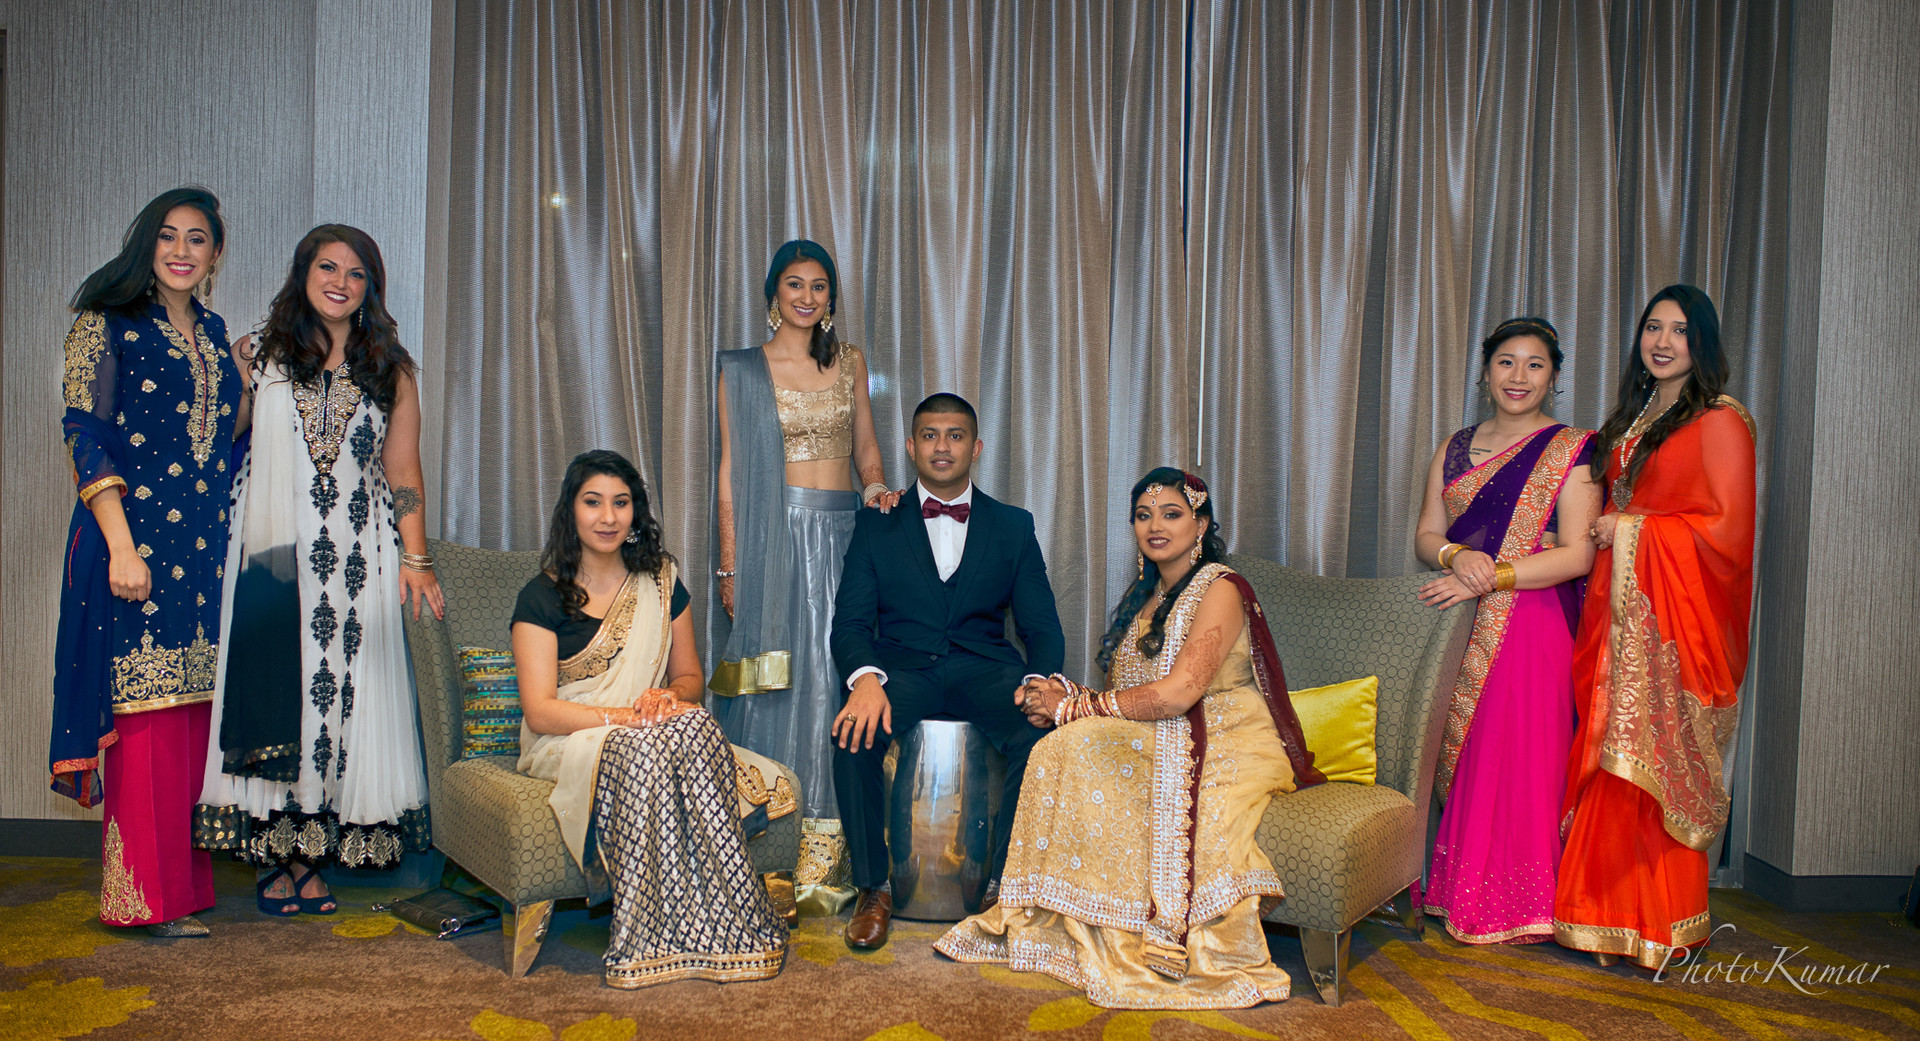 Photokumar-islamic-wedding-dallas-fort-worth-2018-21.jpg